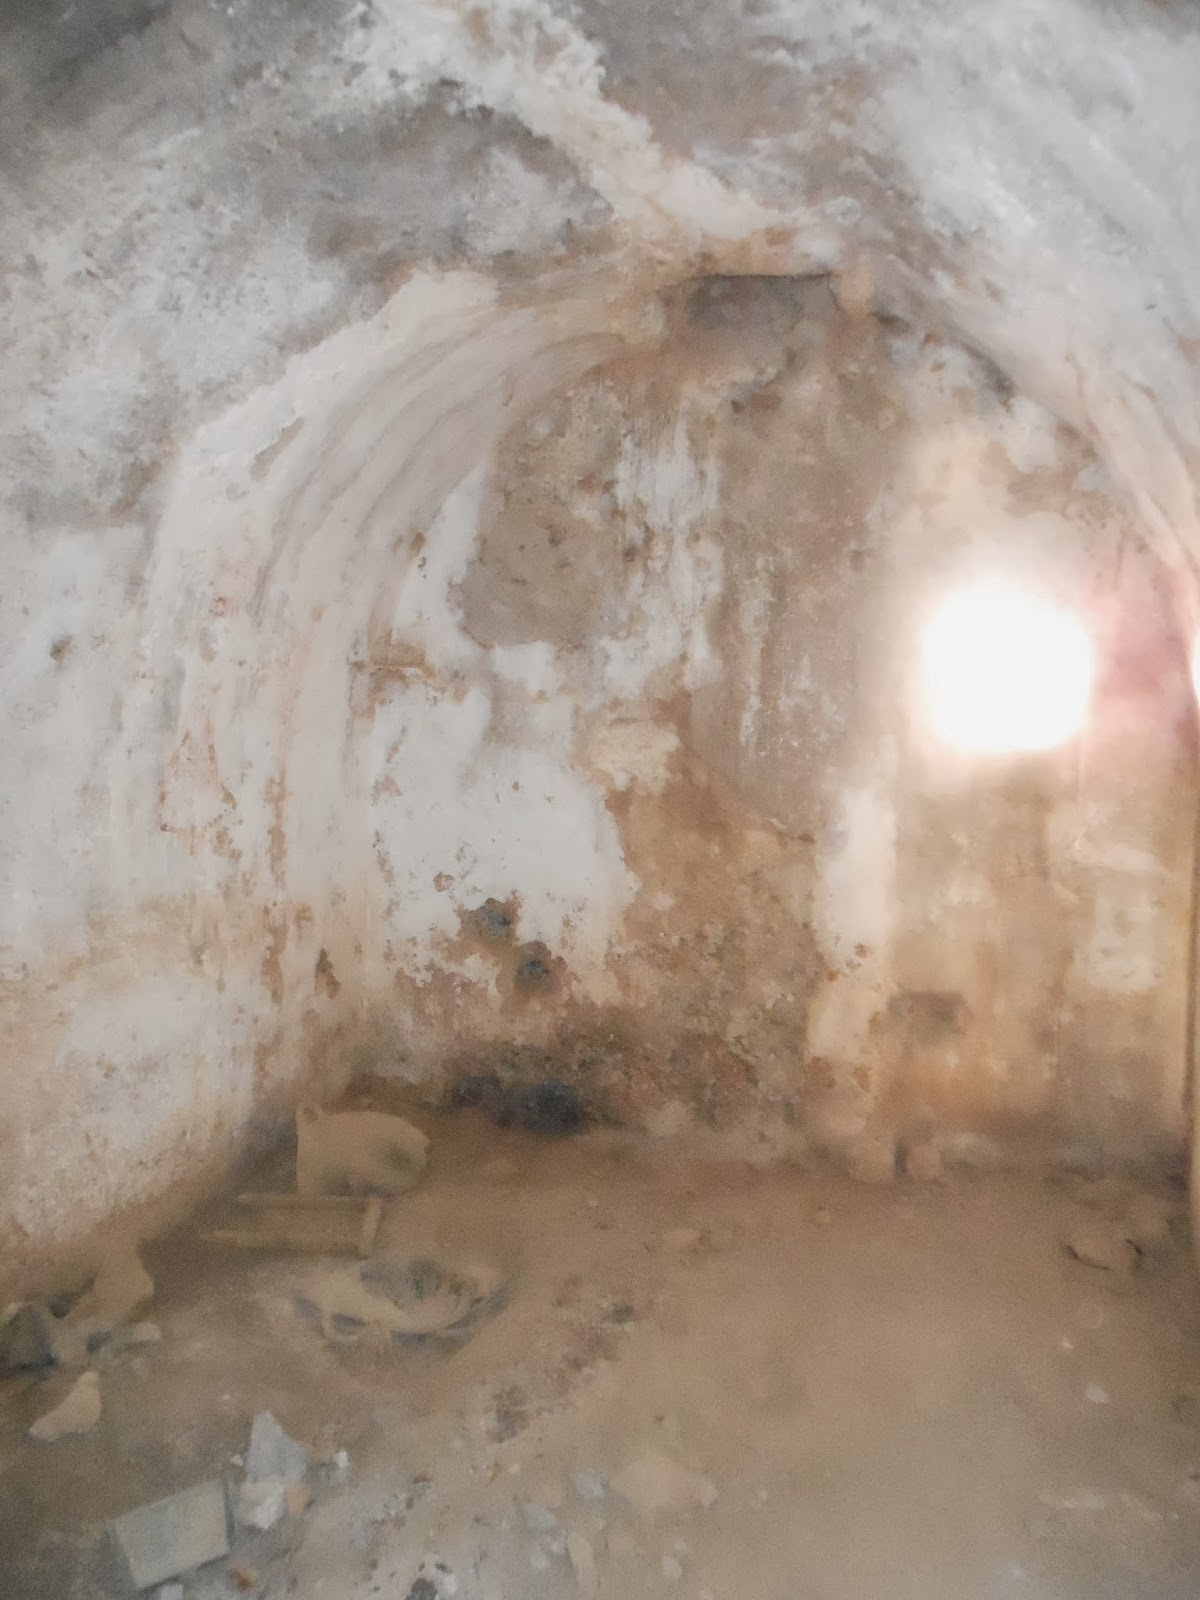 Castillo de sagunto rutas por su historia las leoneras for Lo espejo 0847 la cisterna